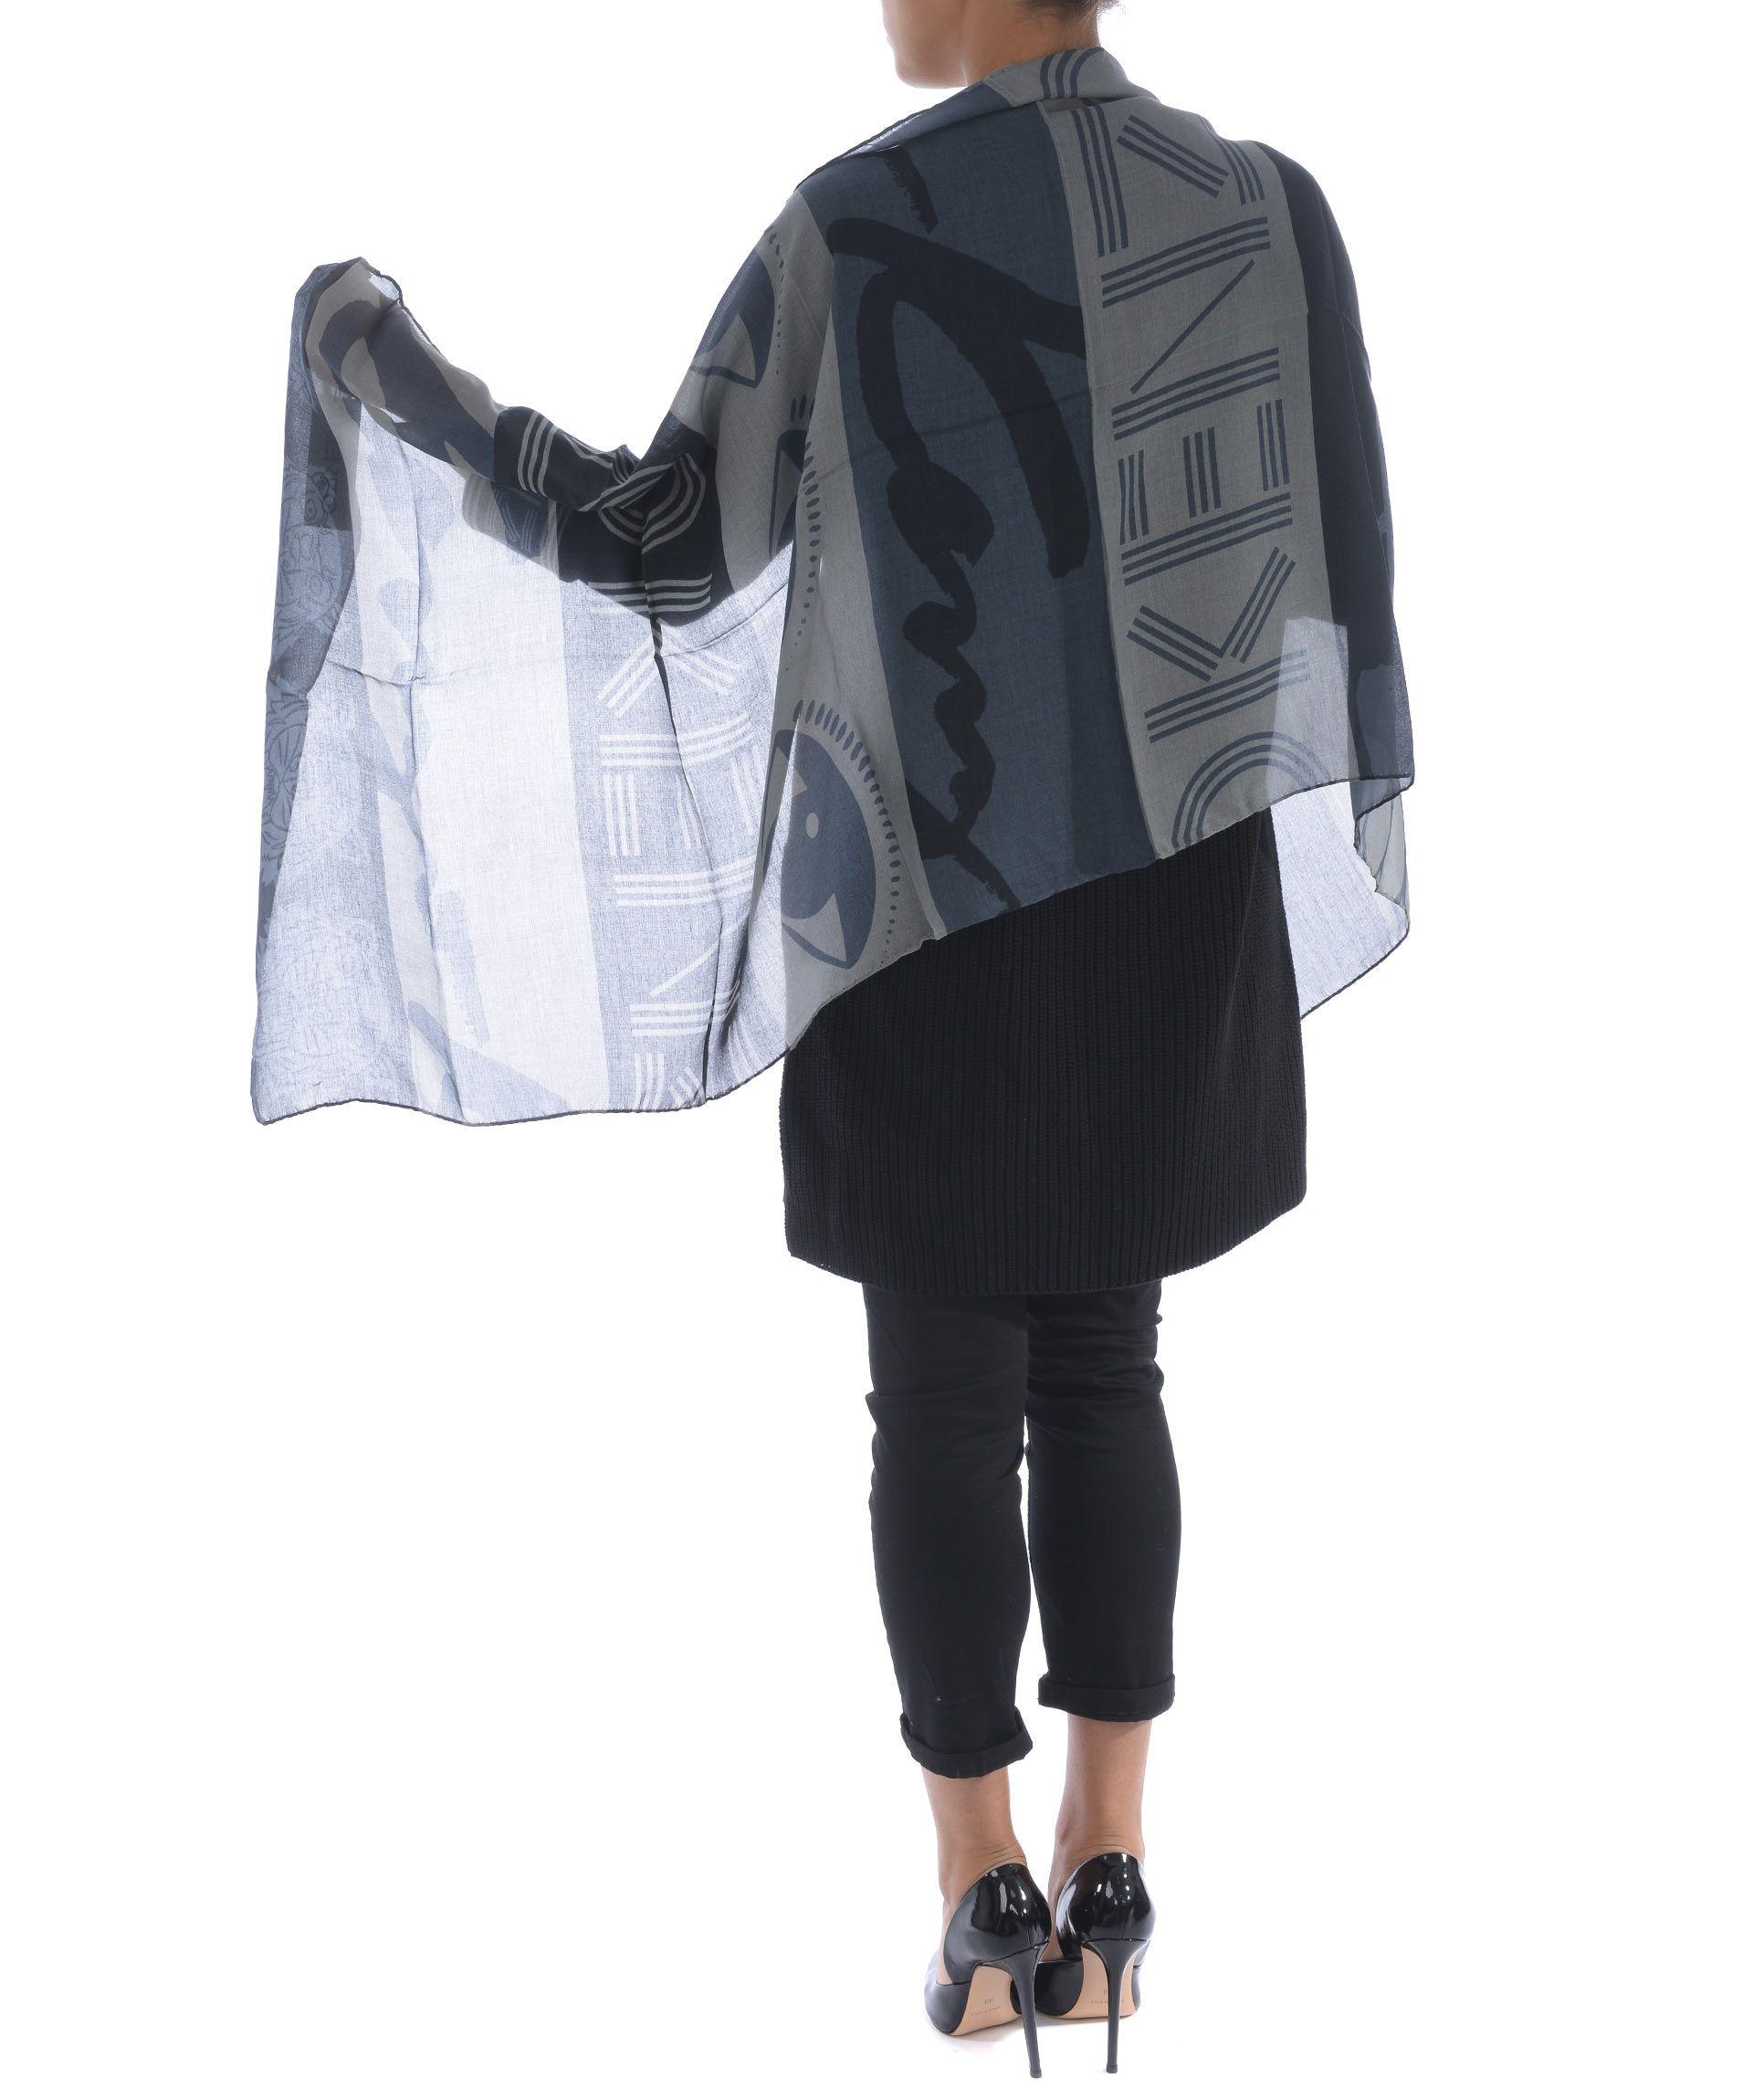 Kenzo Off-White Contrast Trousers In Grigio/Blu